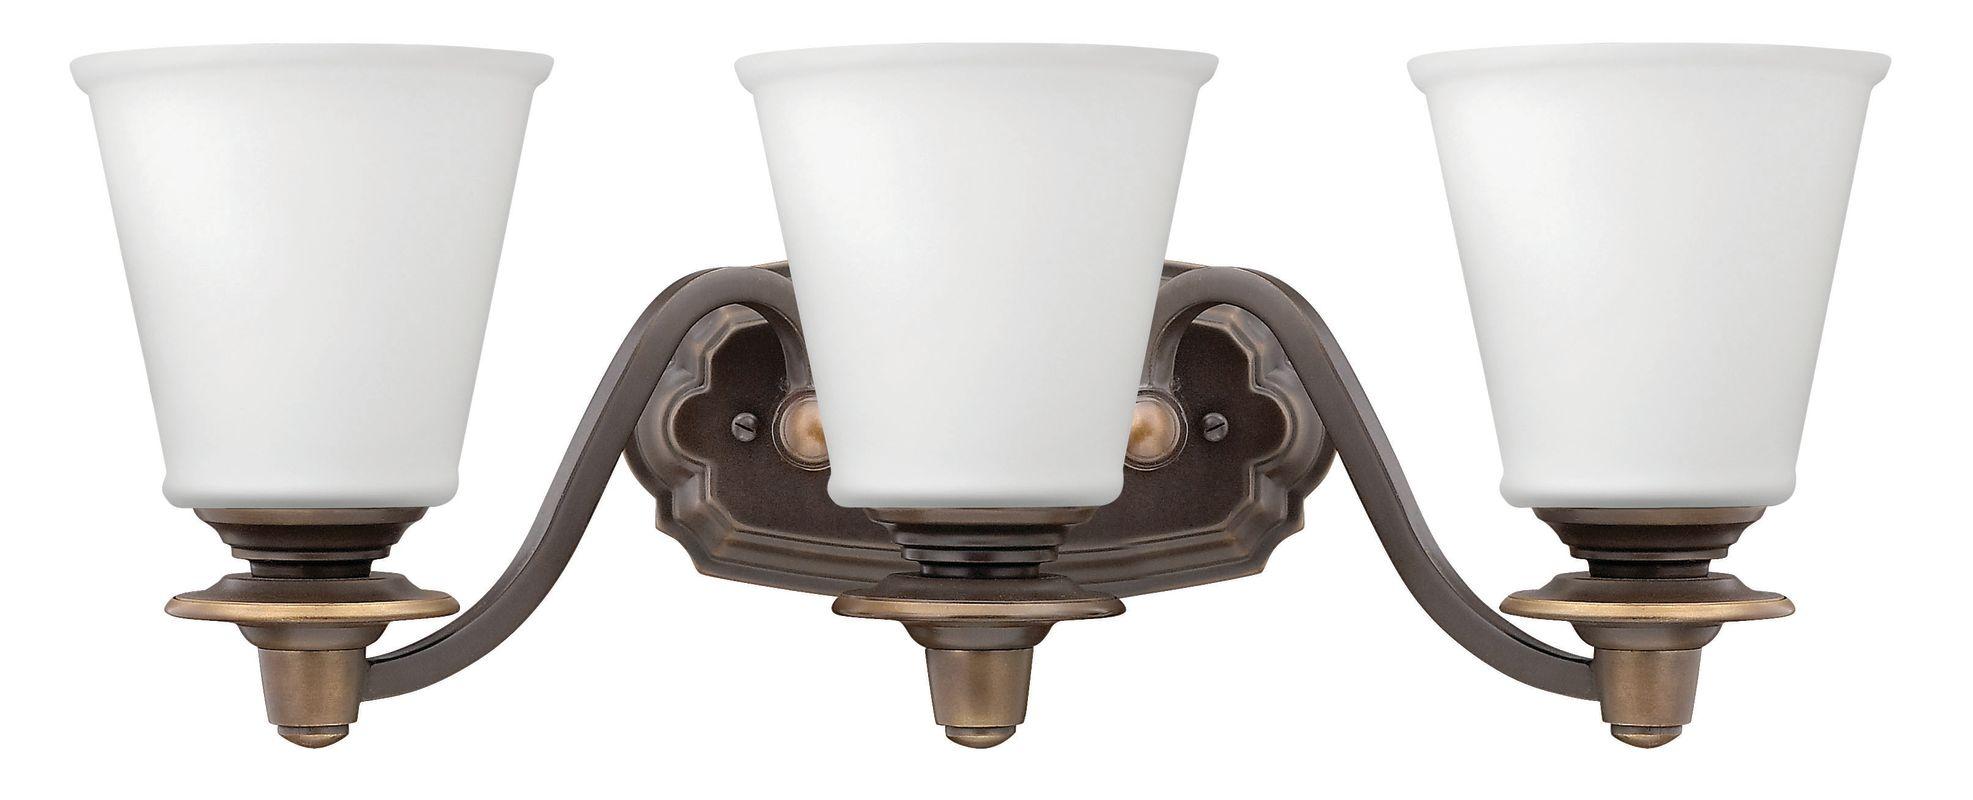 Hinkley Lighting 54263 3 Light Bathroom Vanity Light from the Plymouth